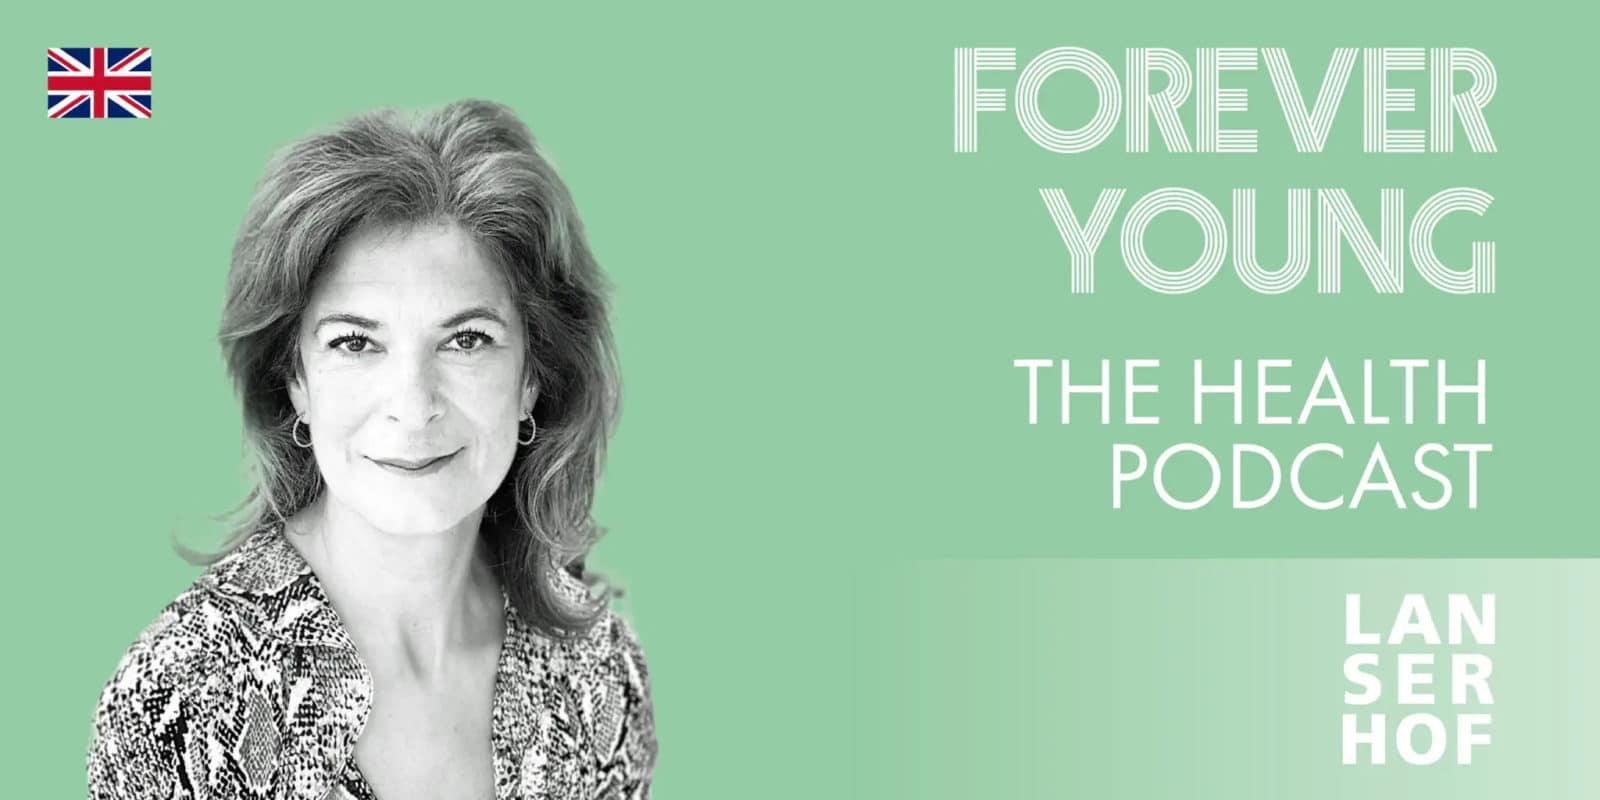 Podcastcover mit Samina Showgi